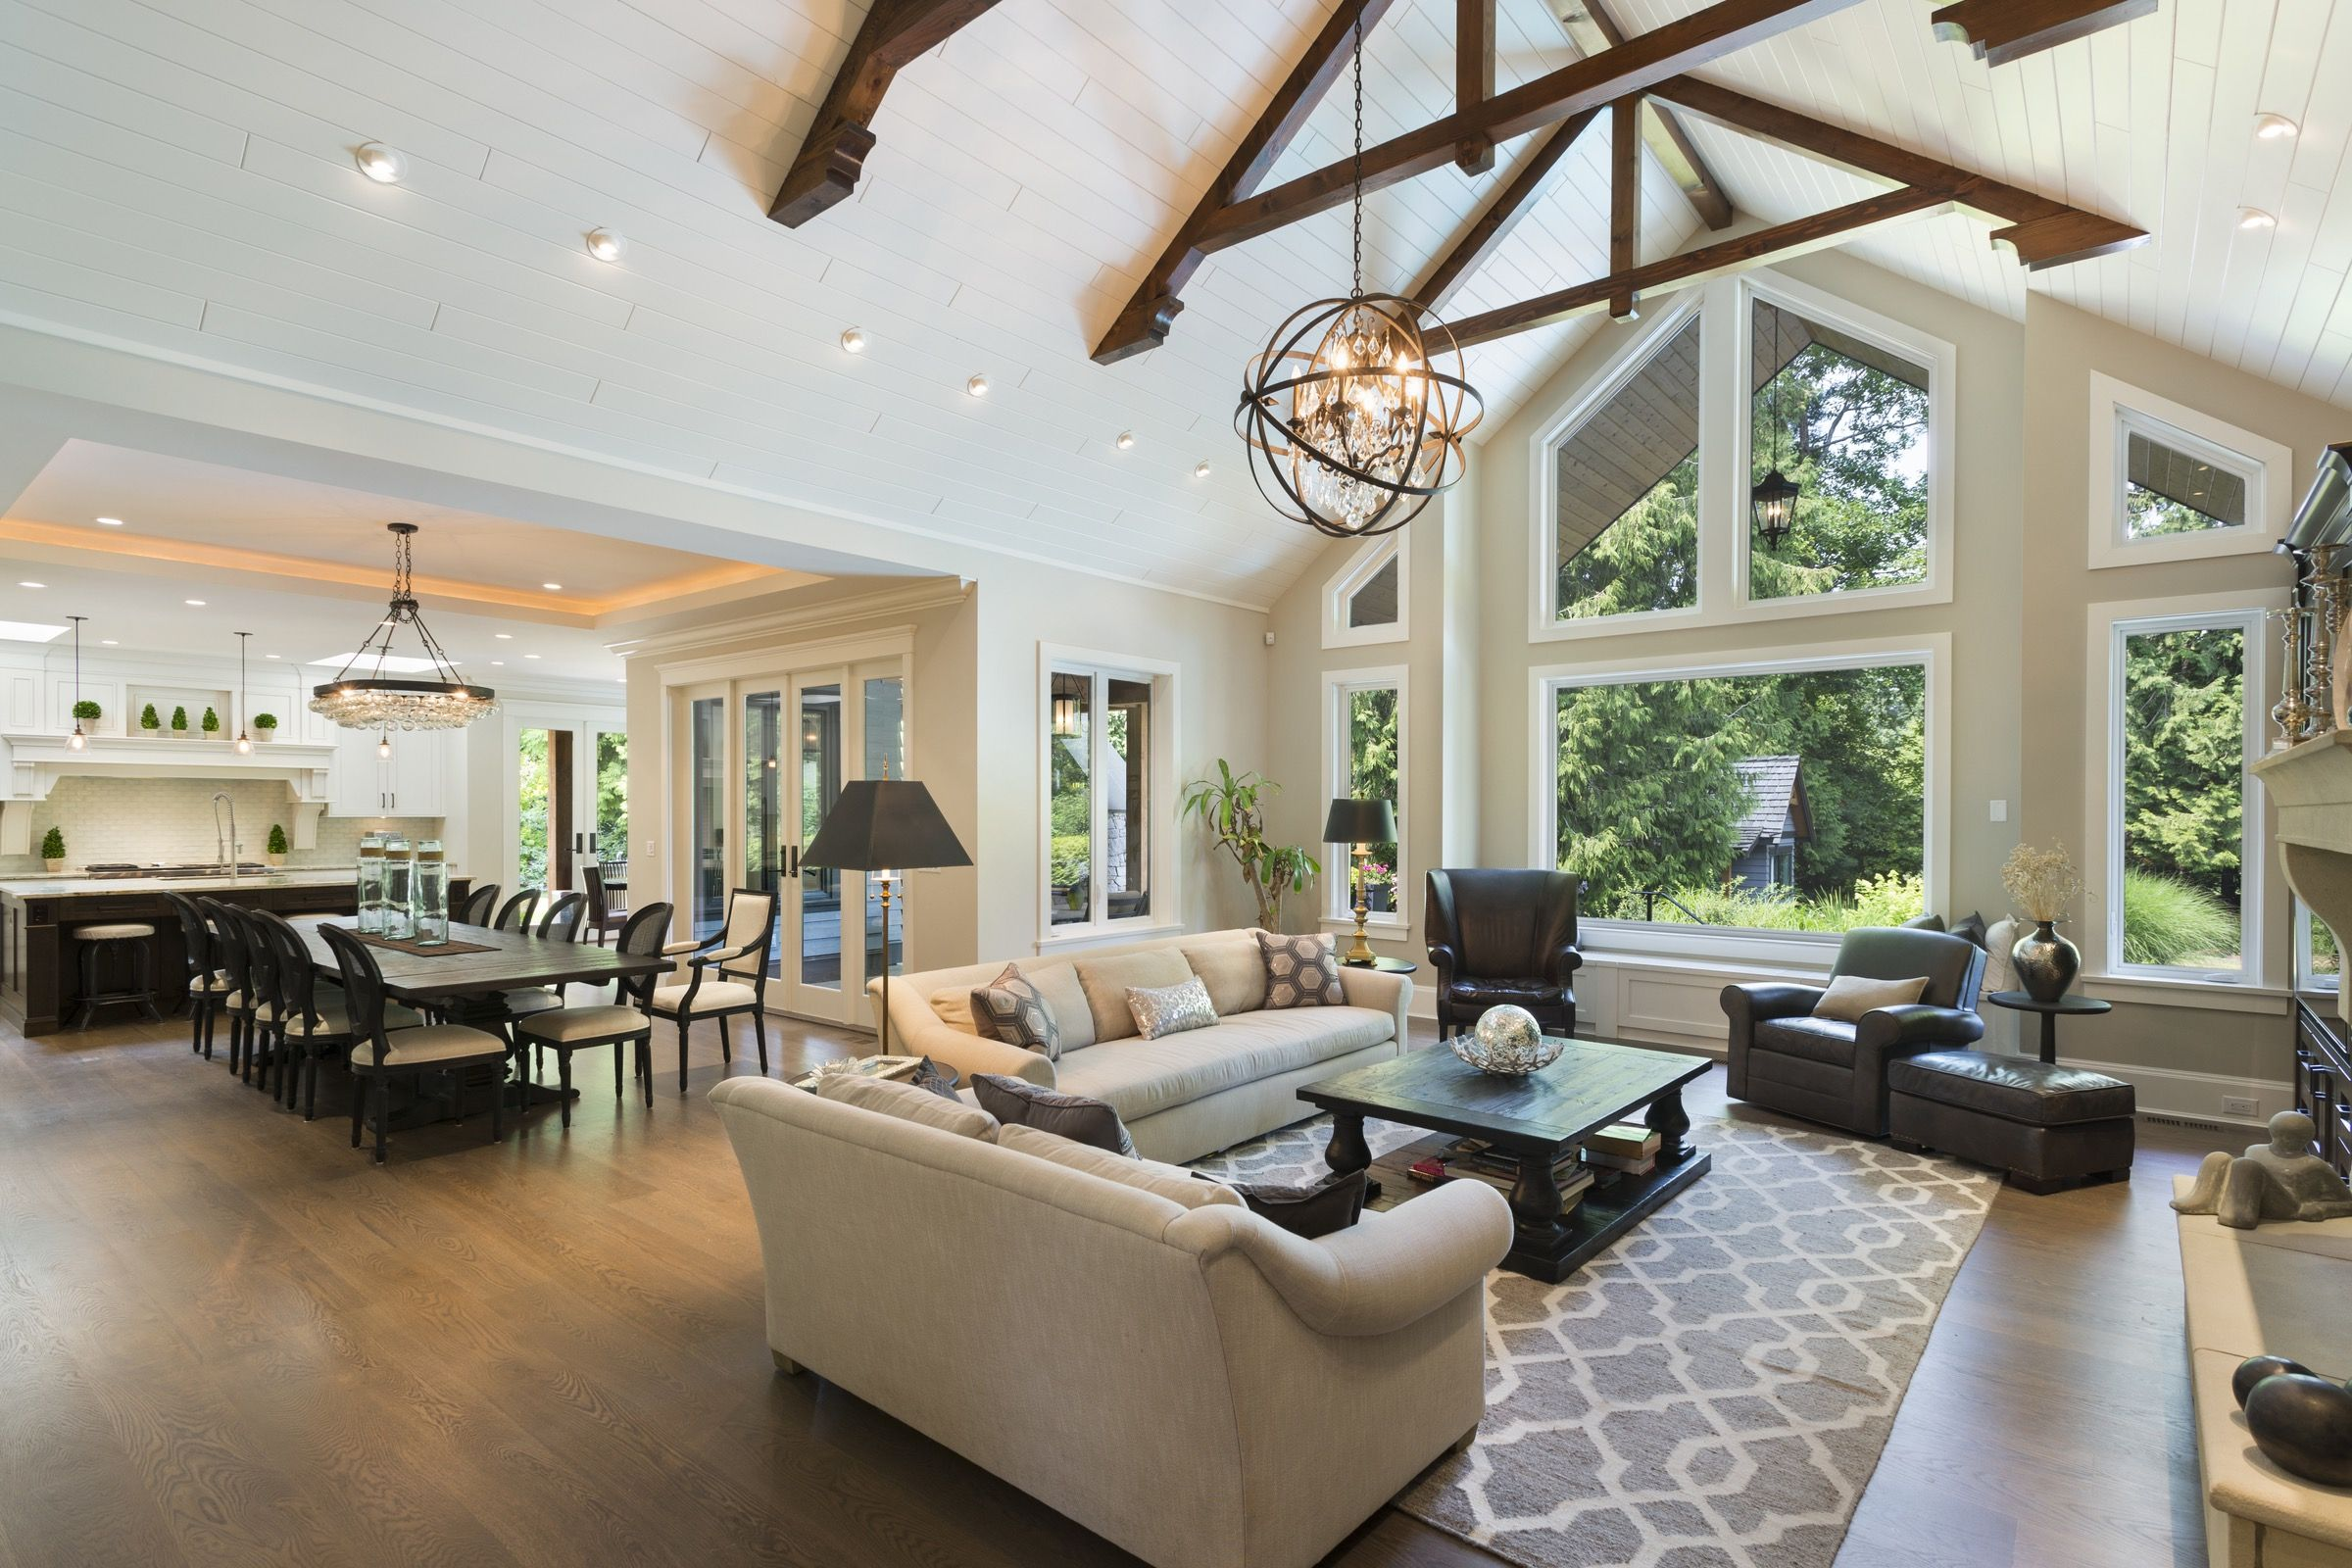 25 Open Plan Living Dining Room Designs Open Living Room Design Open Living Room Farm House Living Room